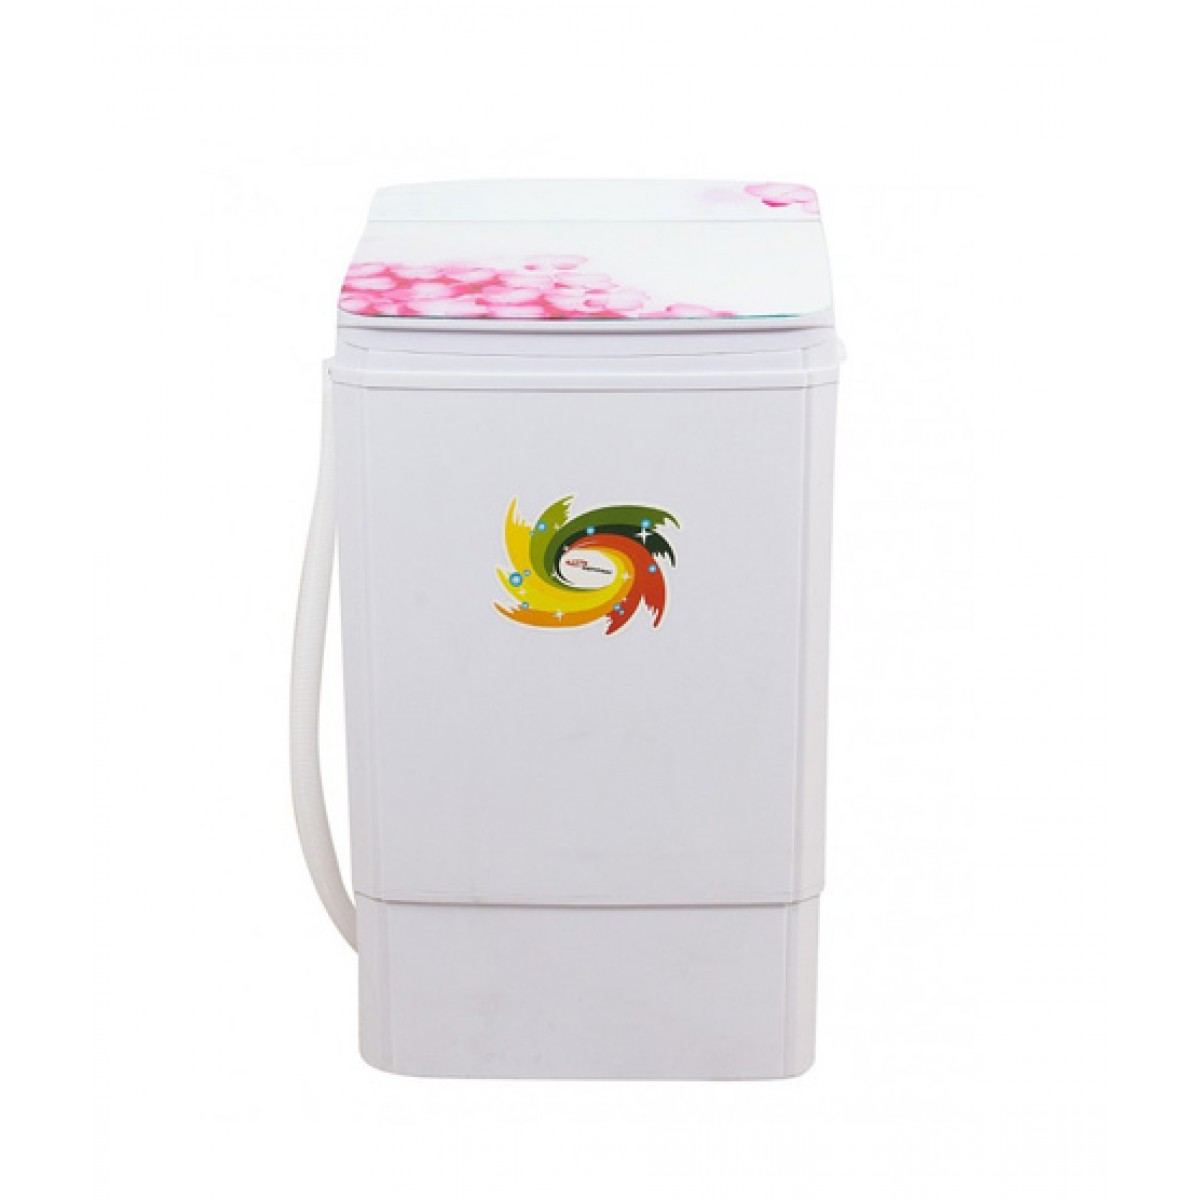 Gaba National Single Tub Washing Machine 9KG (GNW-92017)